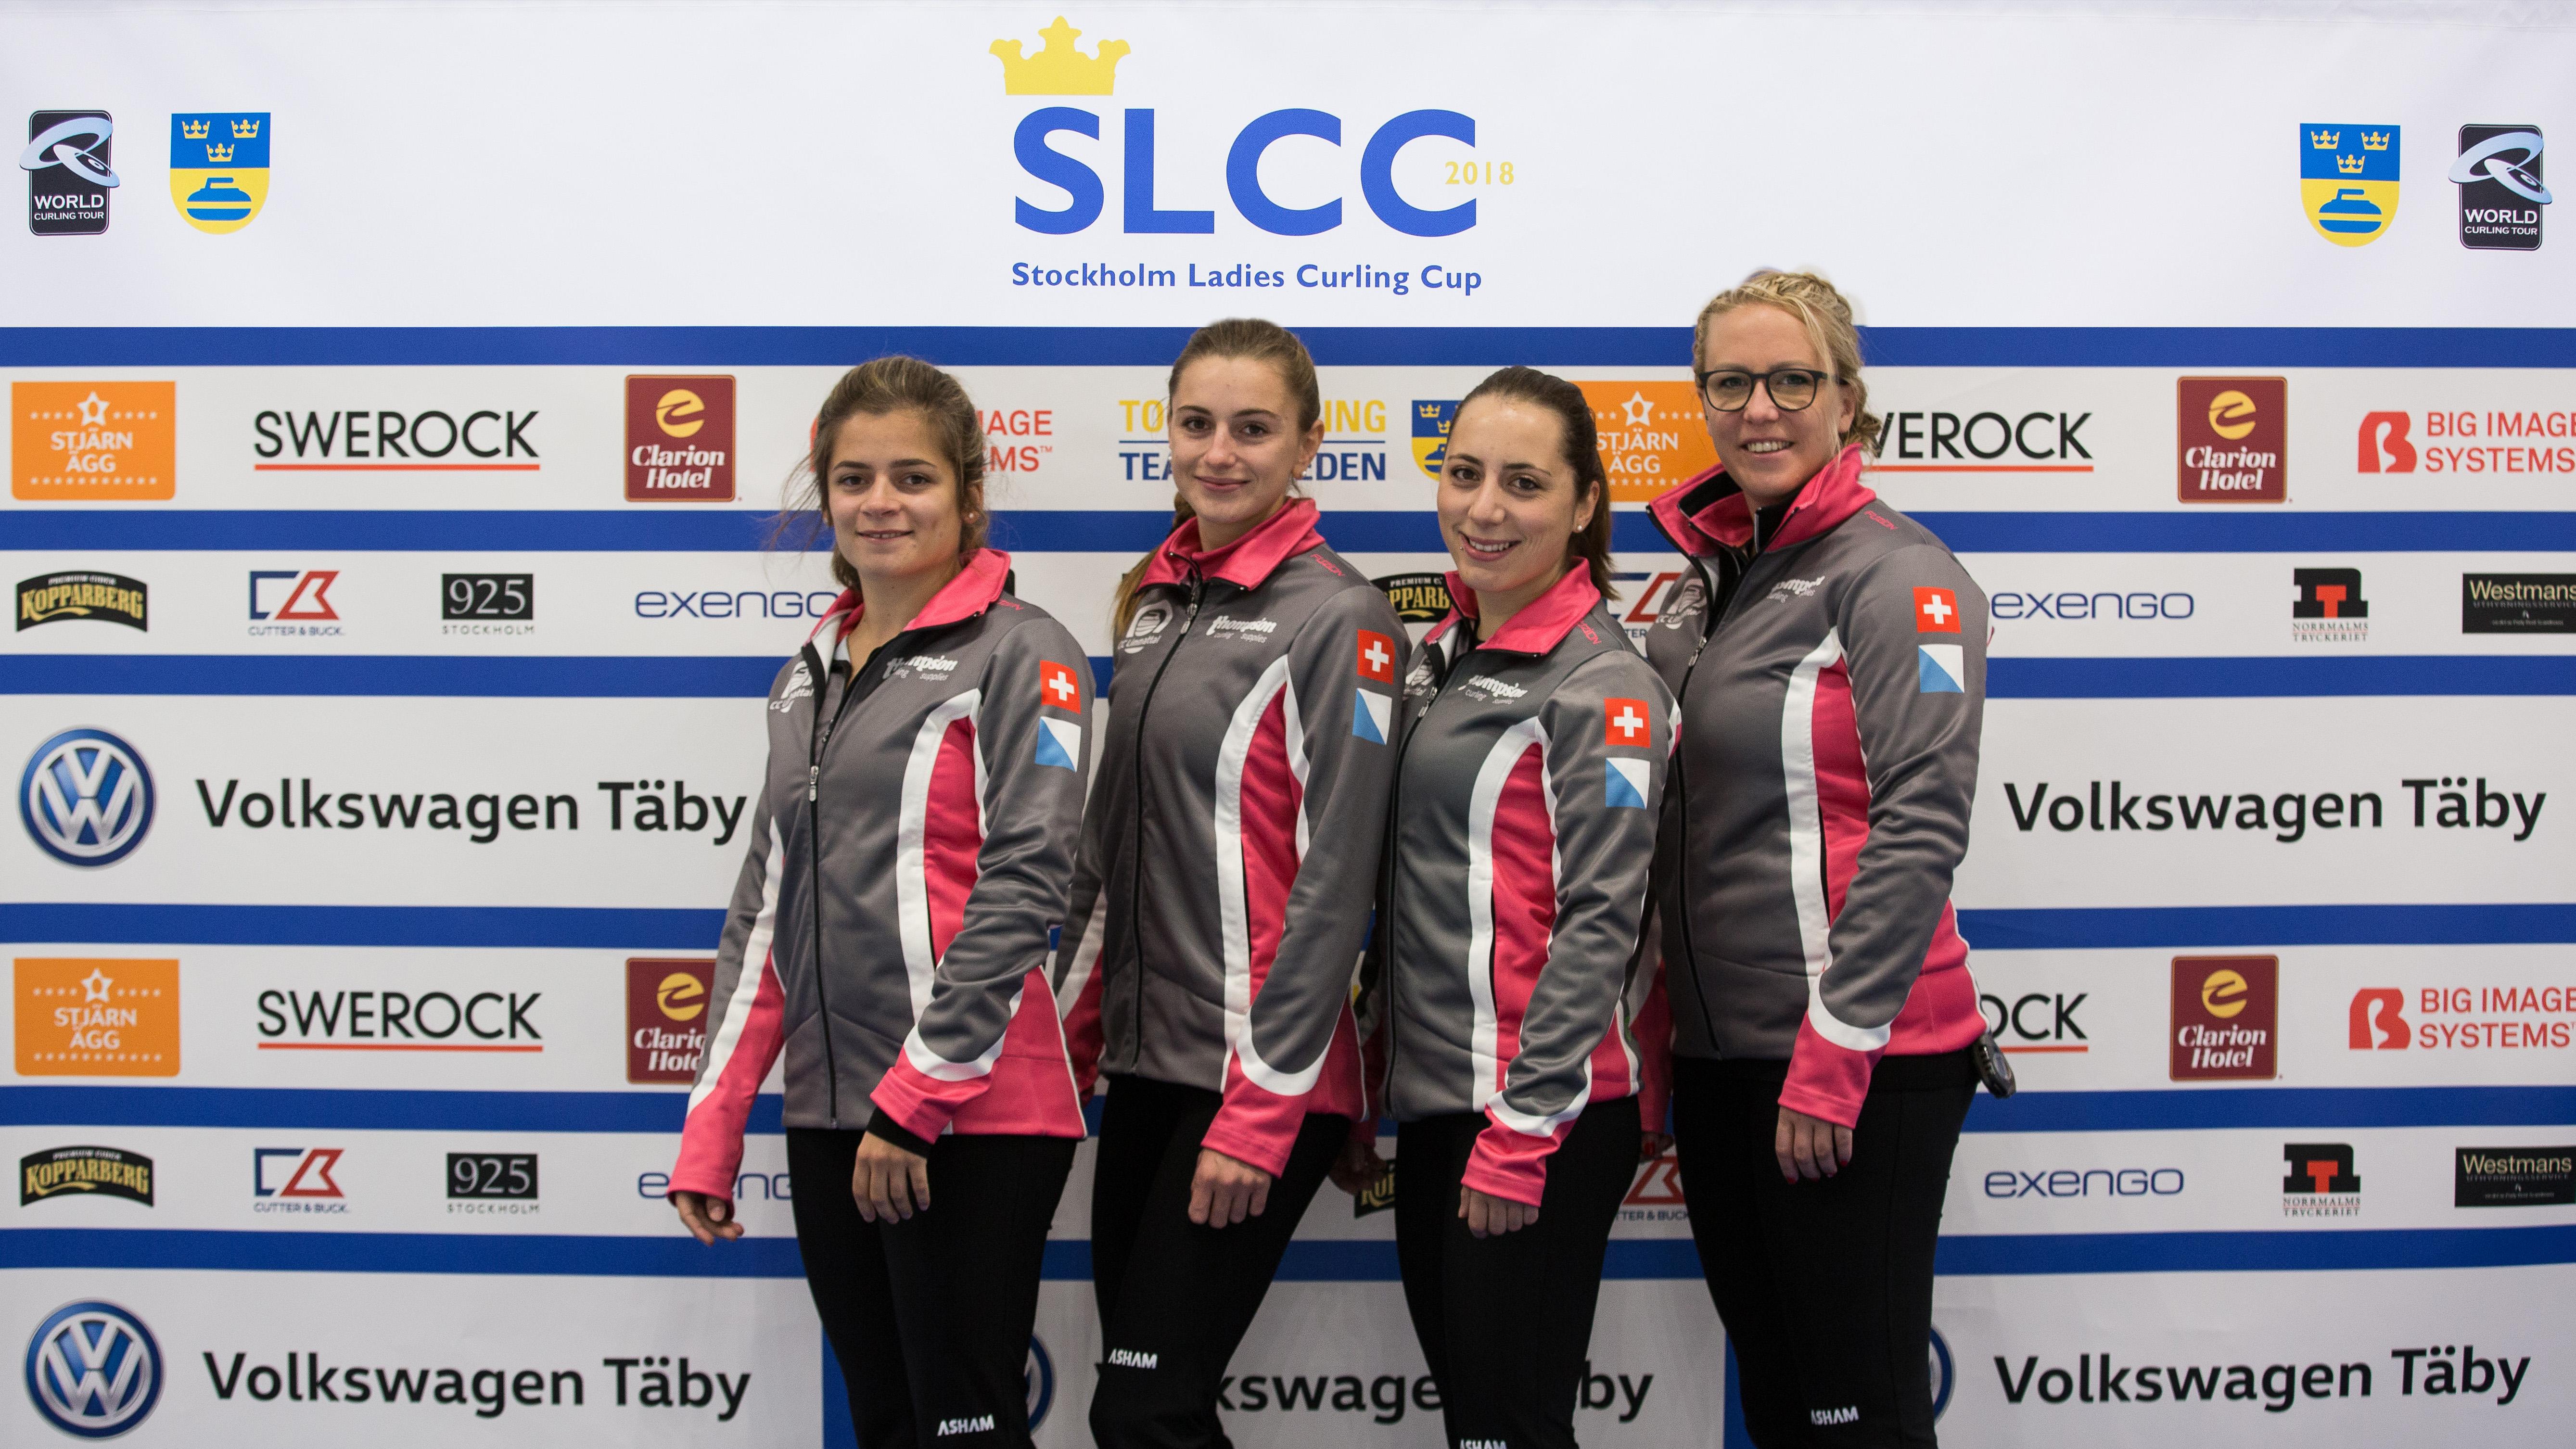 Team Schori